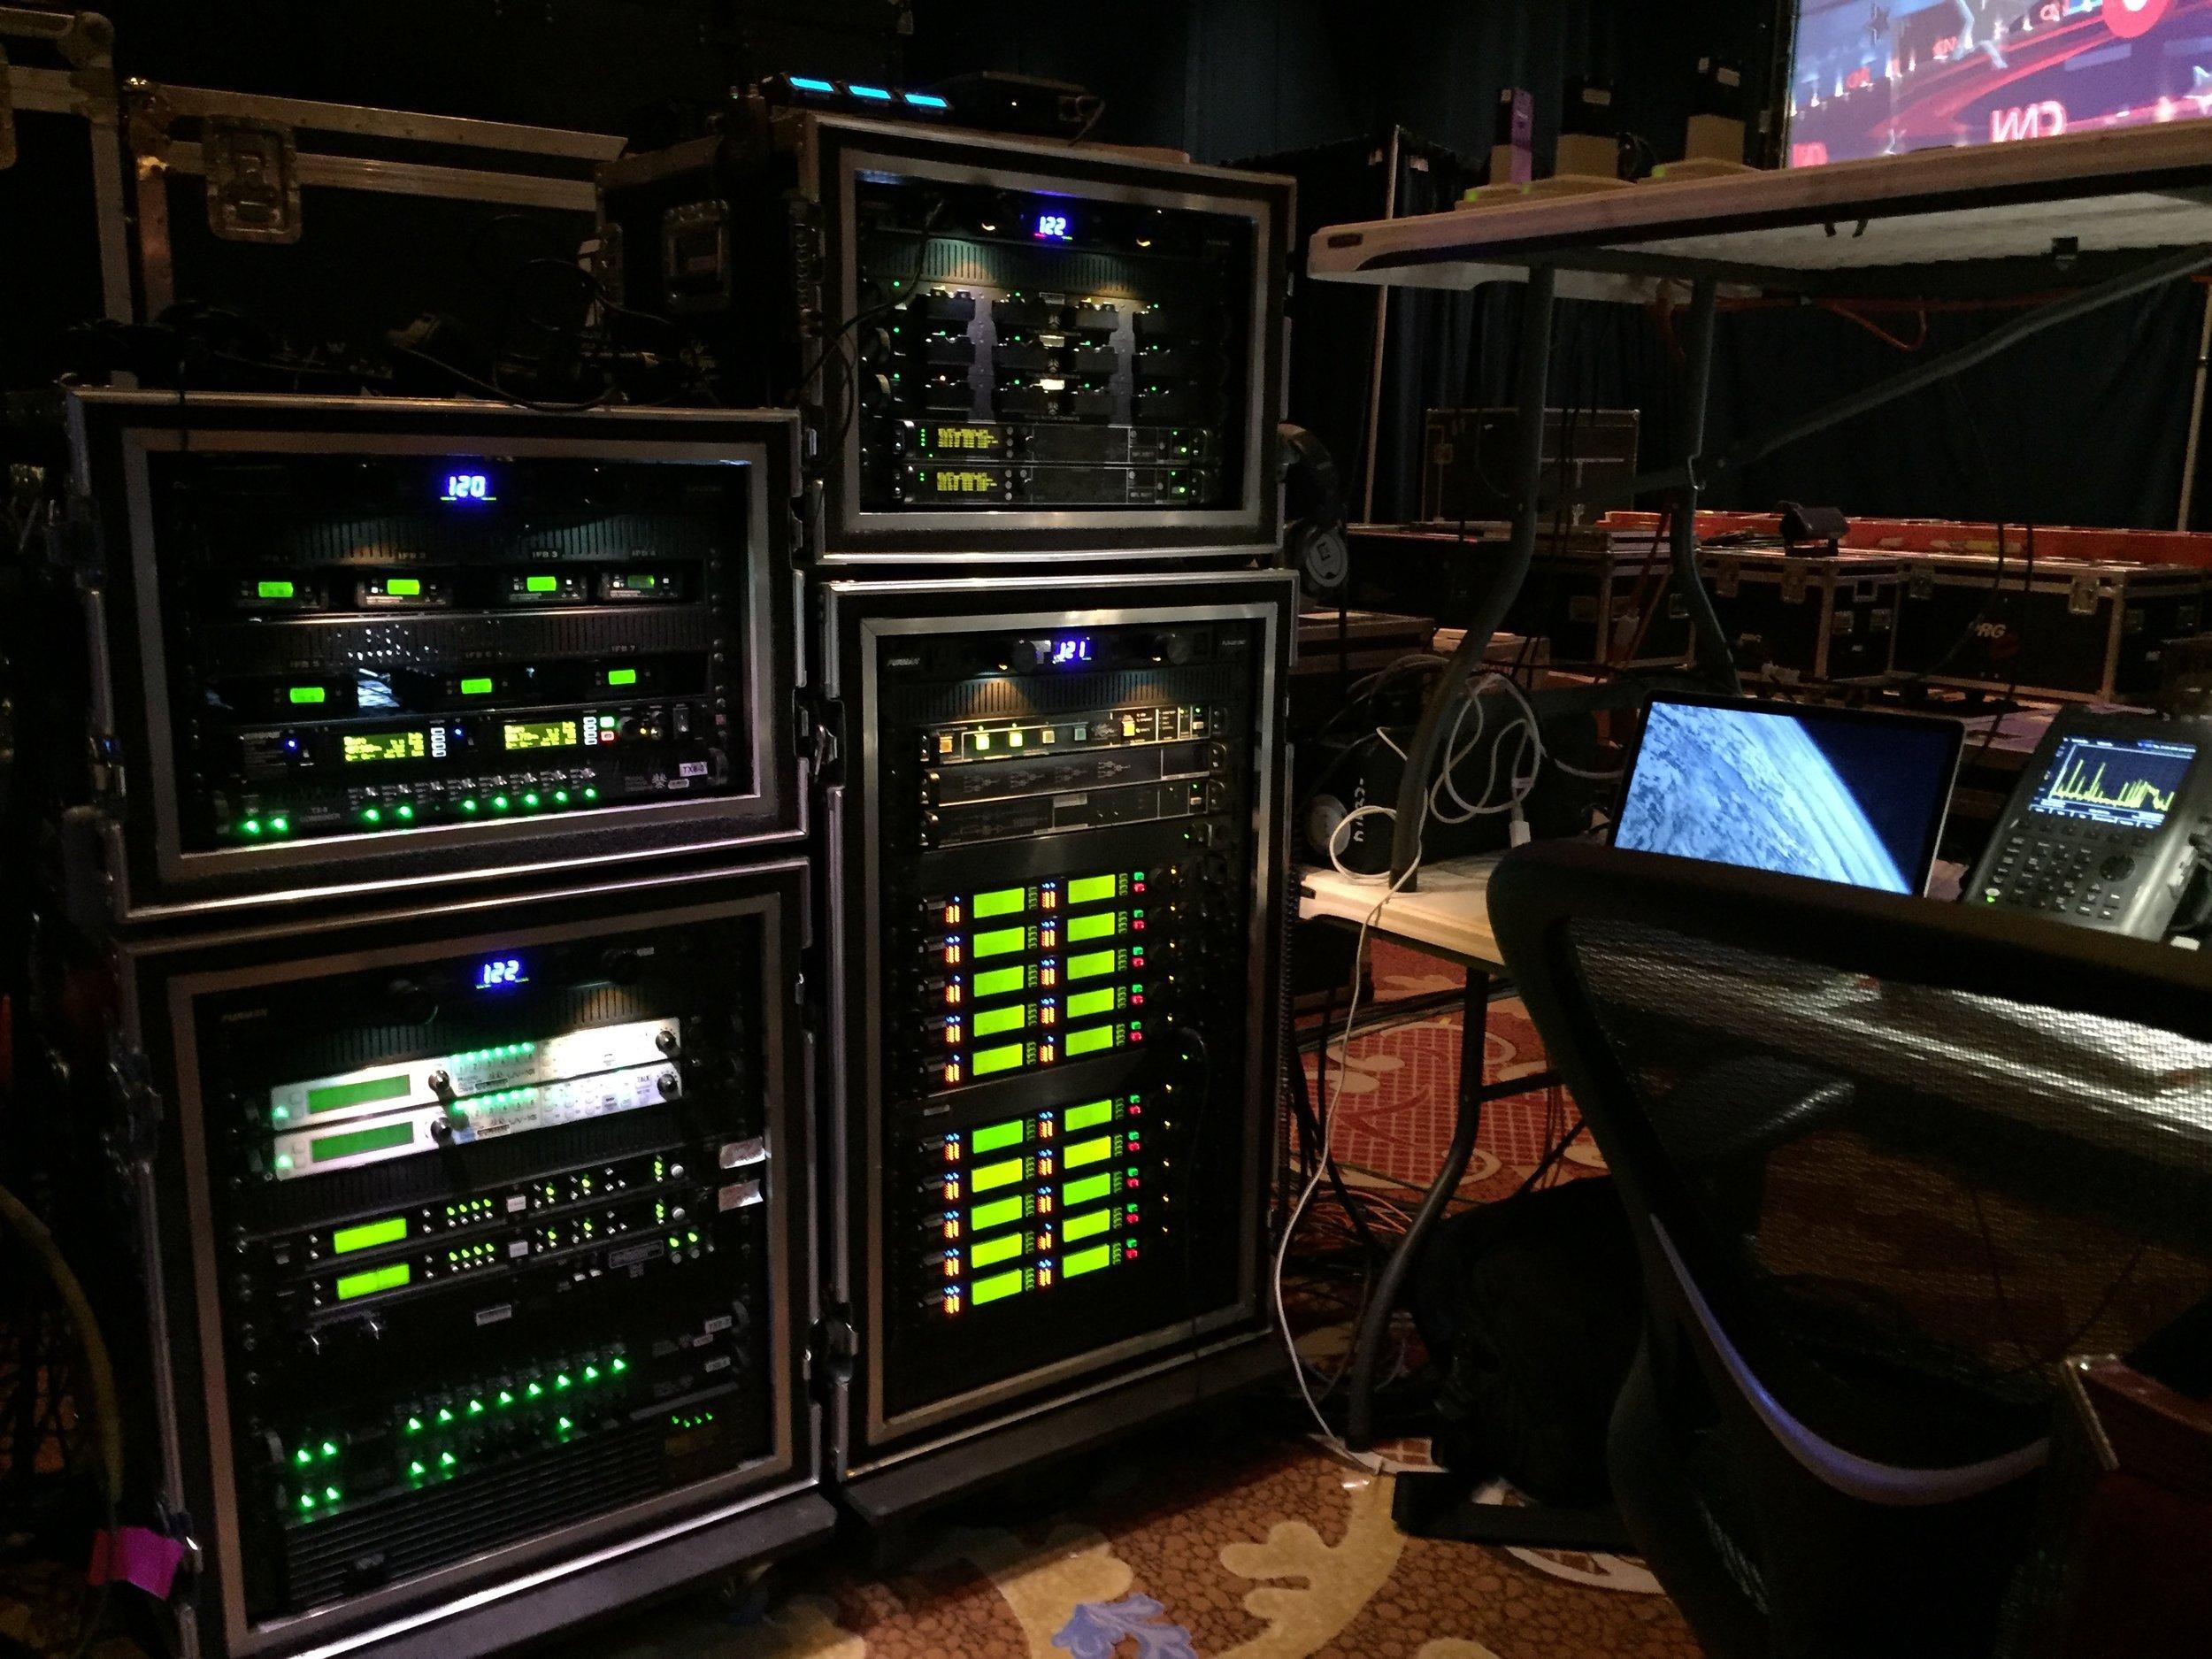 cnn_debate_gear set-up.jpg